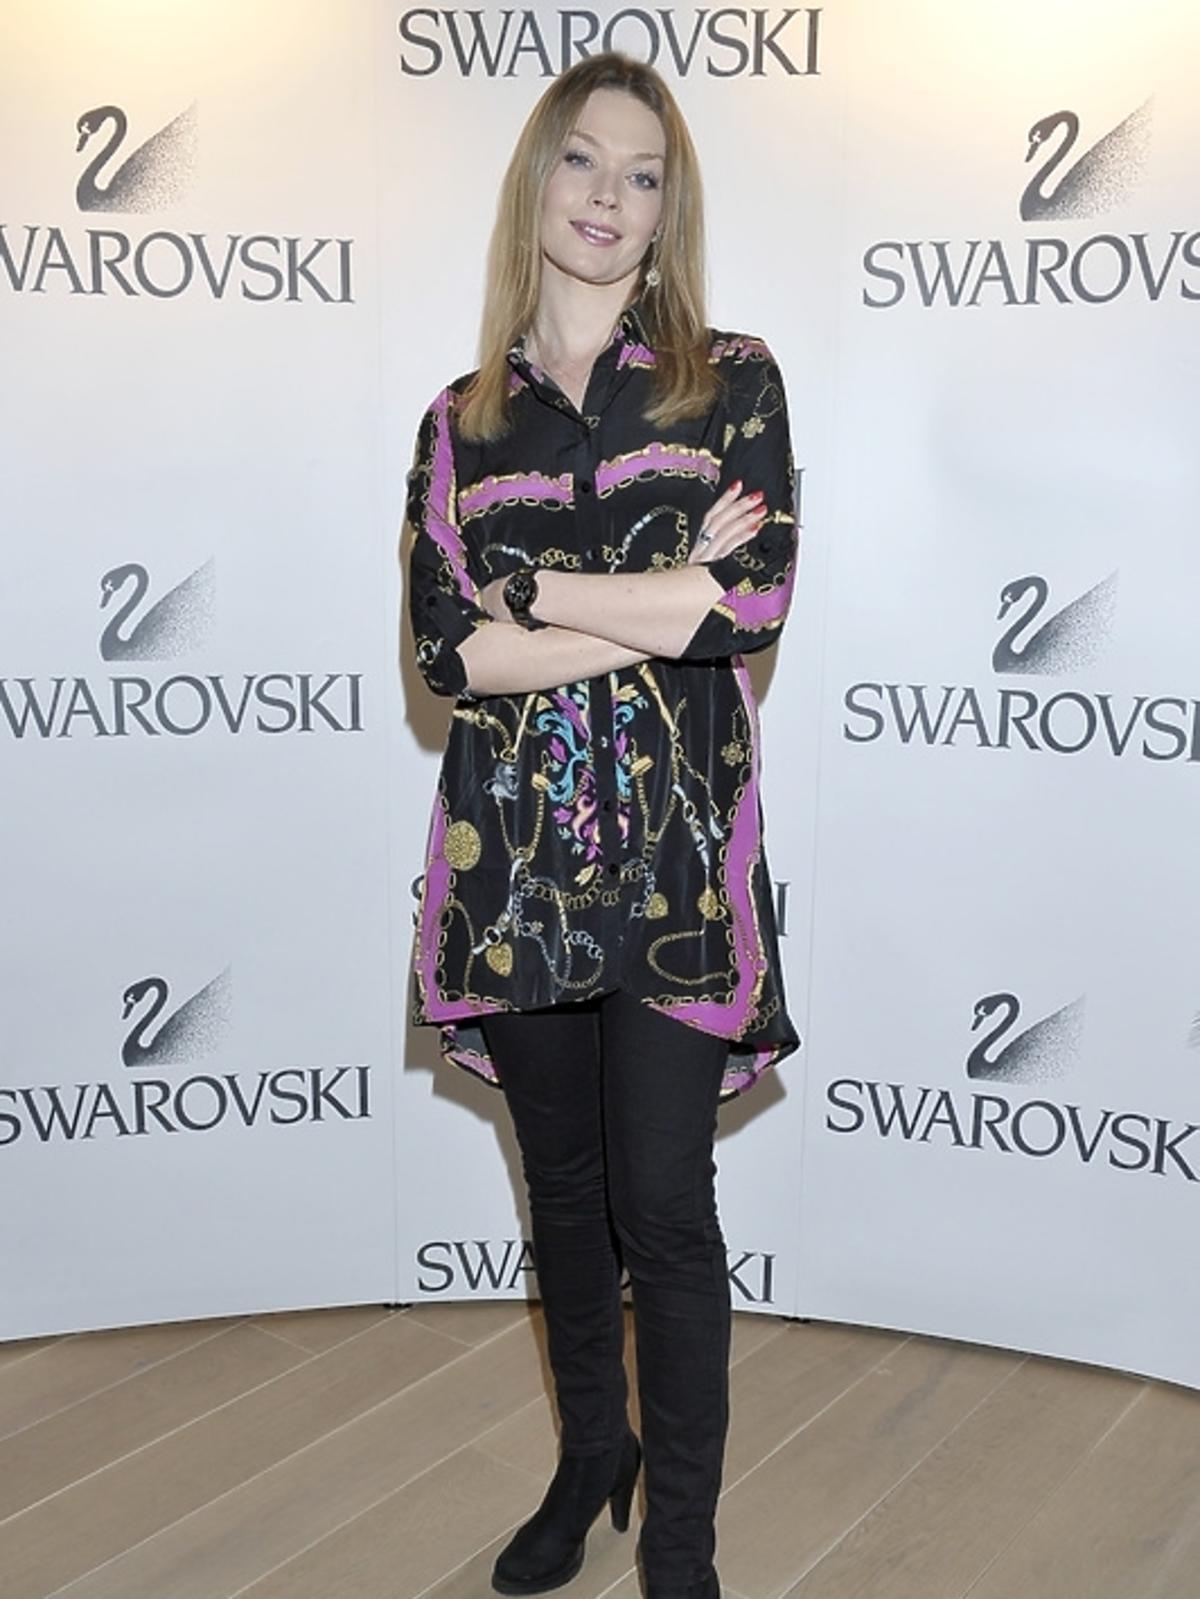 Tamara Arciuch na pokazie kolekcji Swarovski - lato 2013